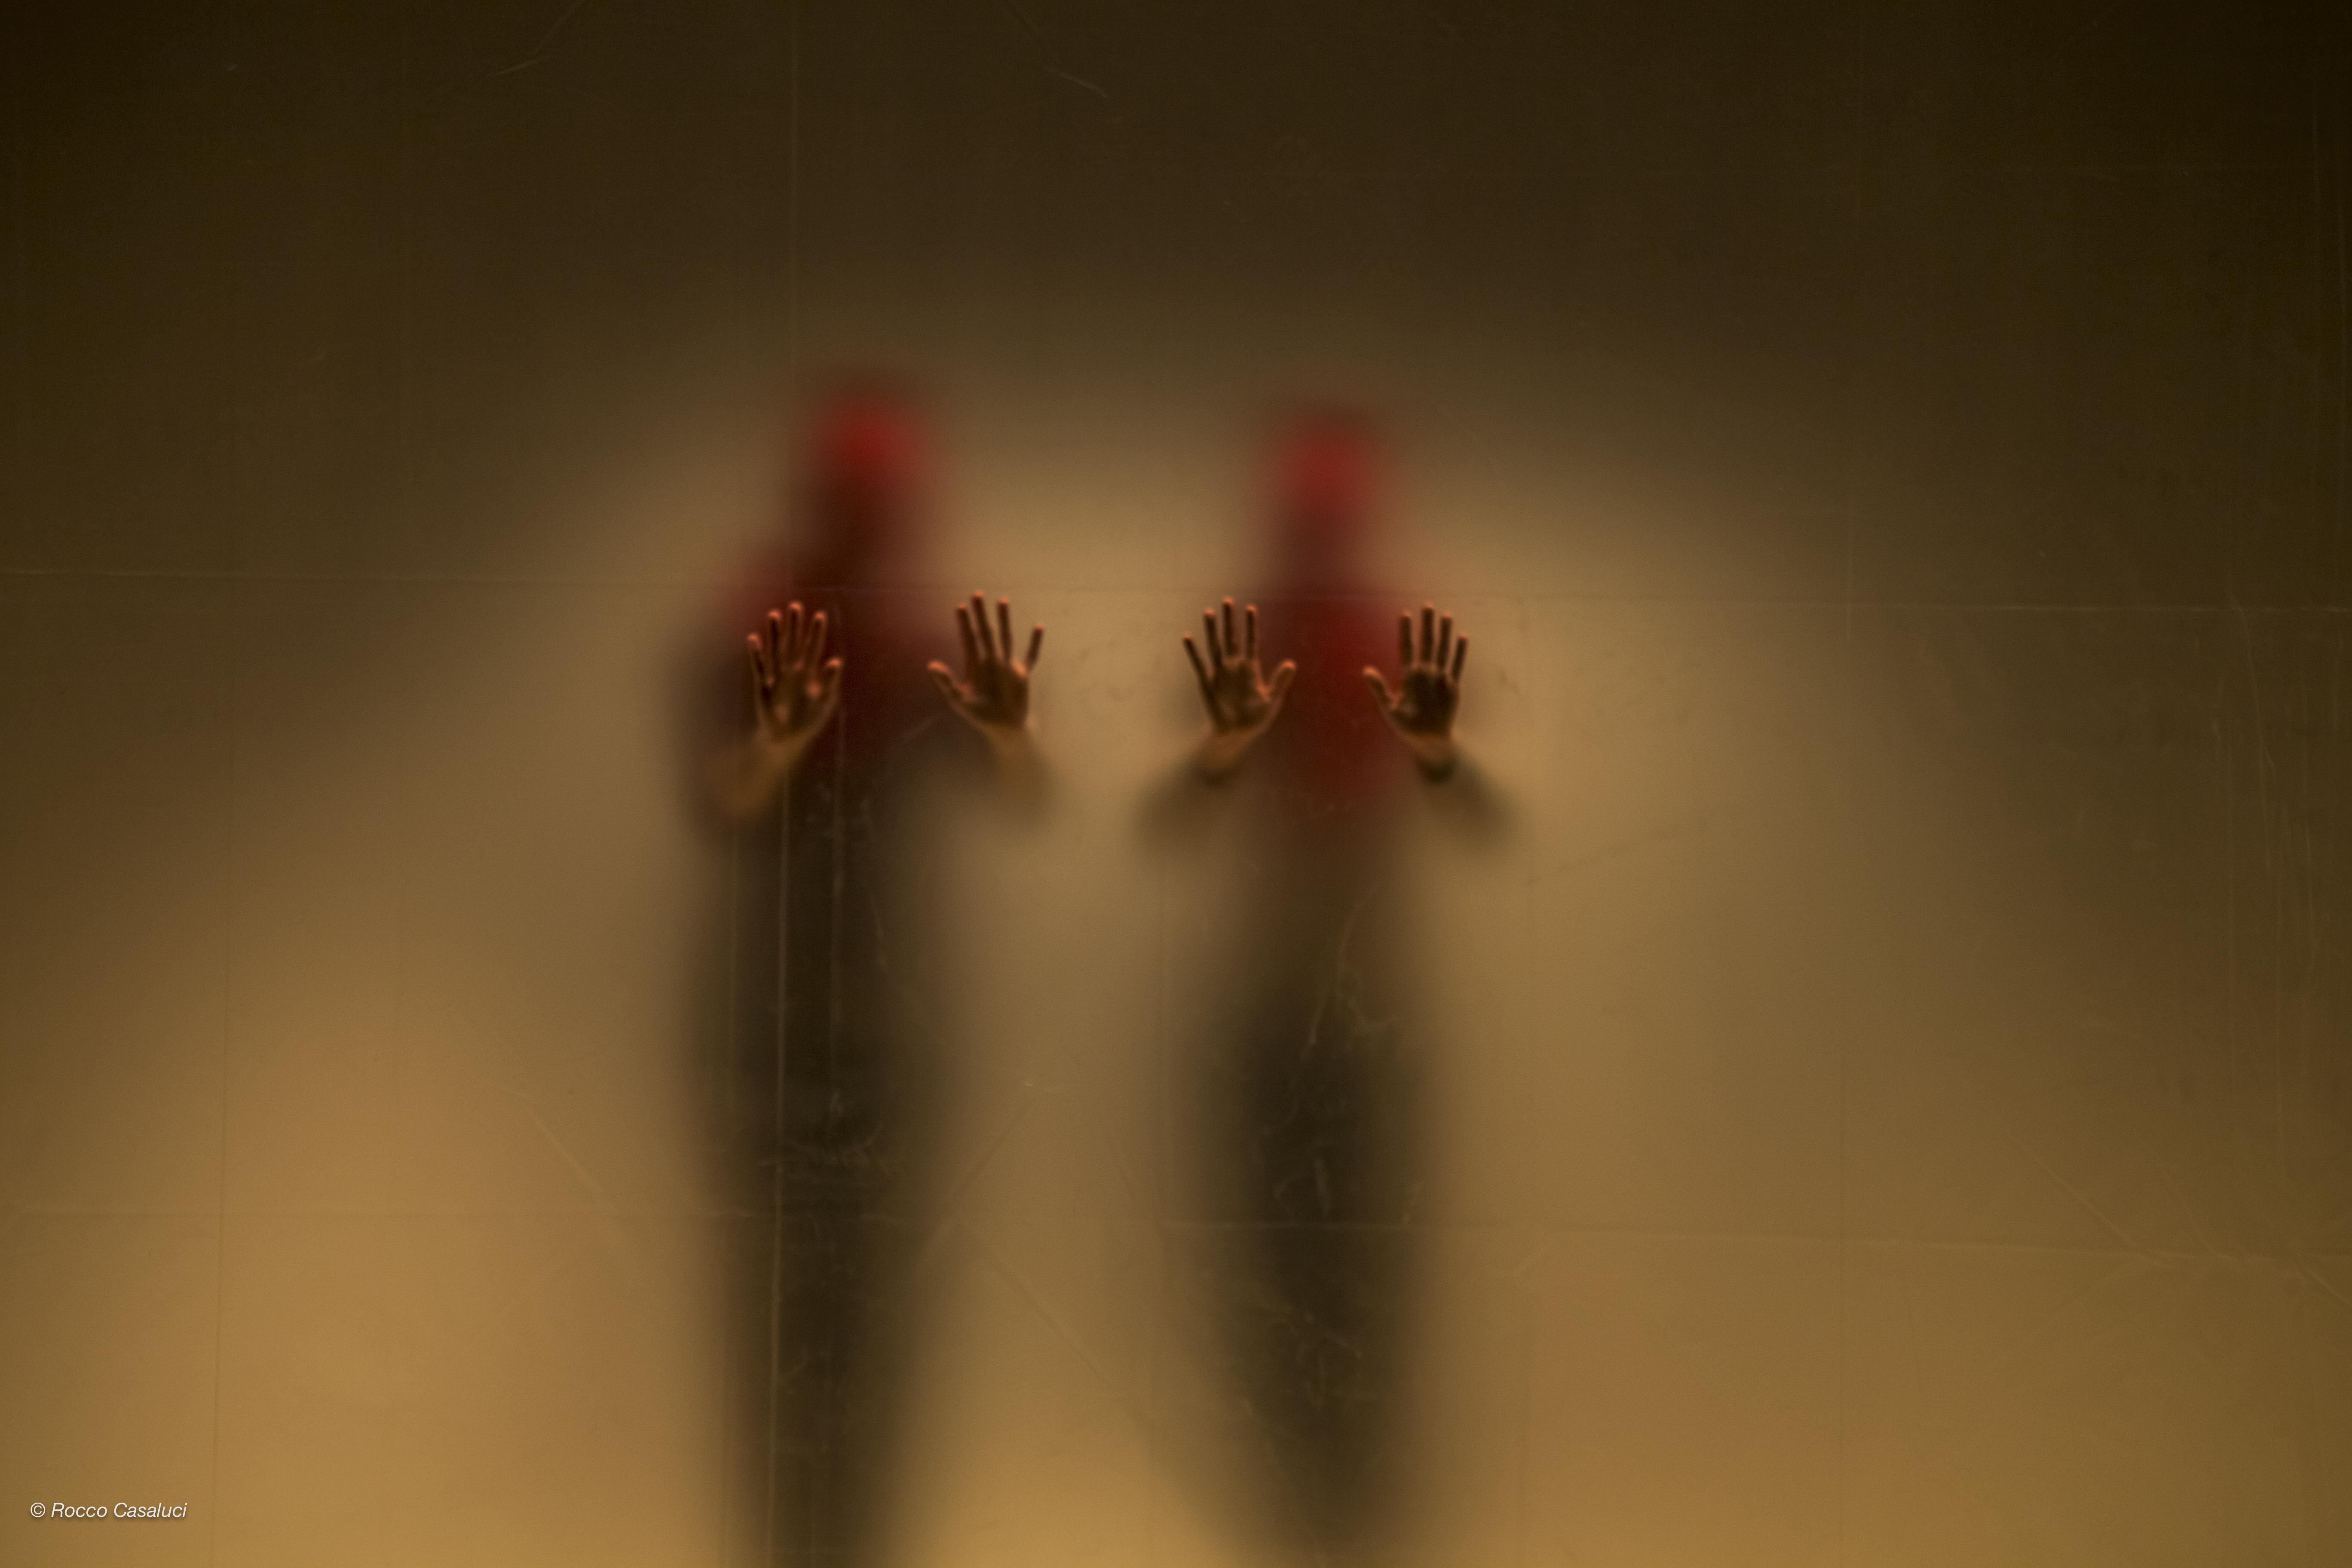 Chukrum foto ©Rocco Casaluci